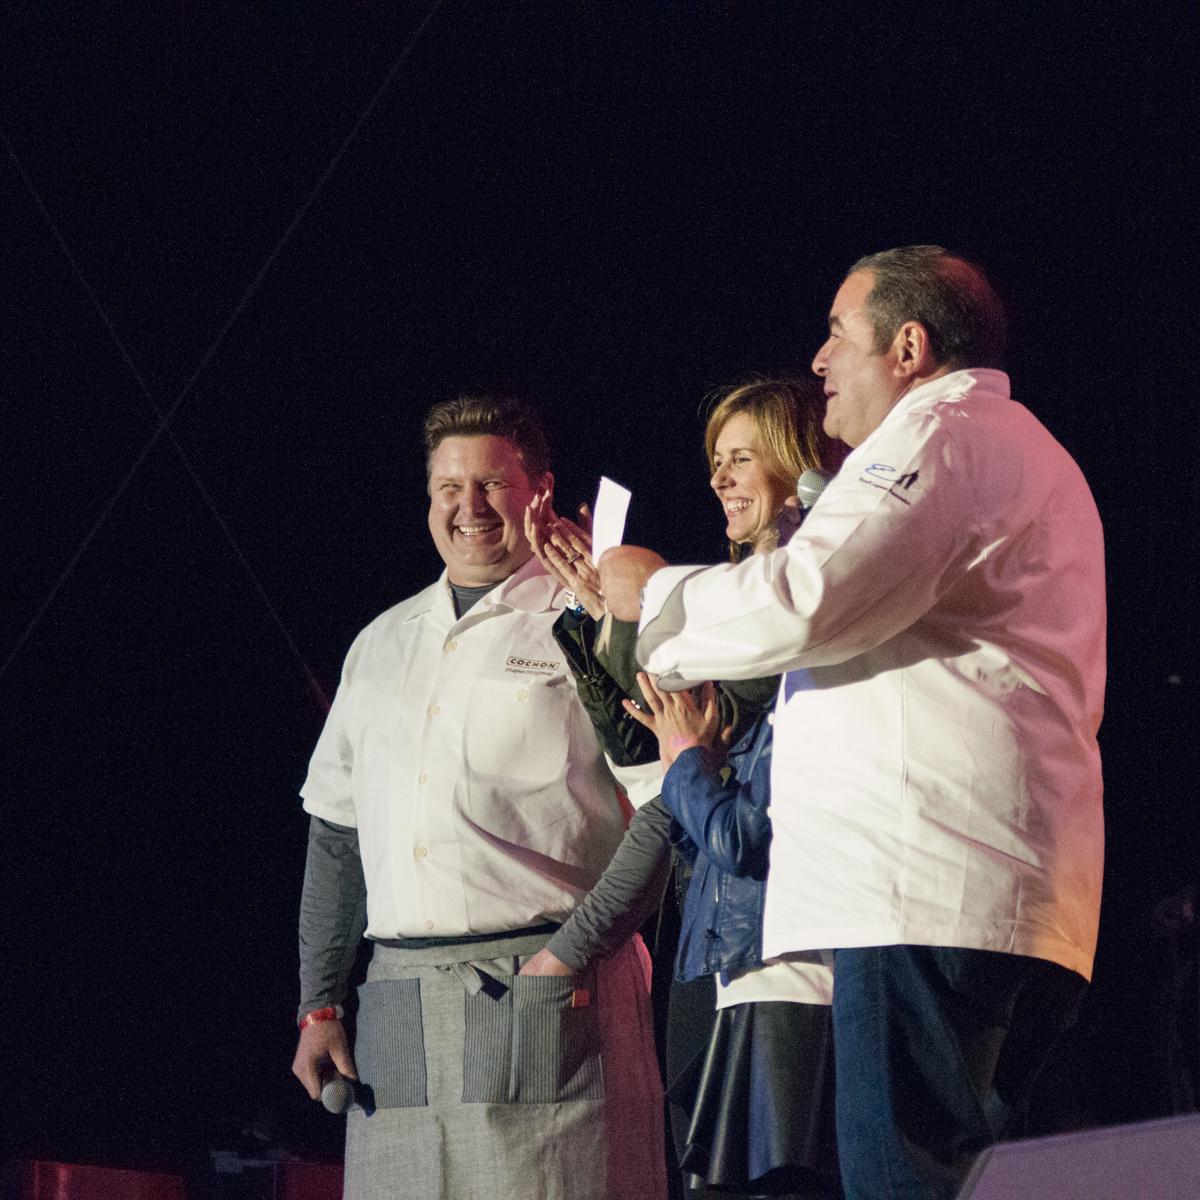 Stephen Stryjewski, Alden Lagasse, and Chef Emeril Lagasse.